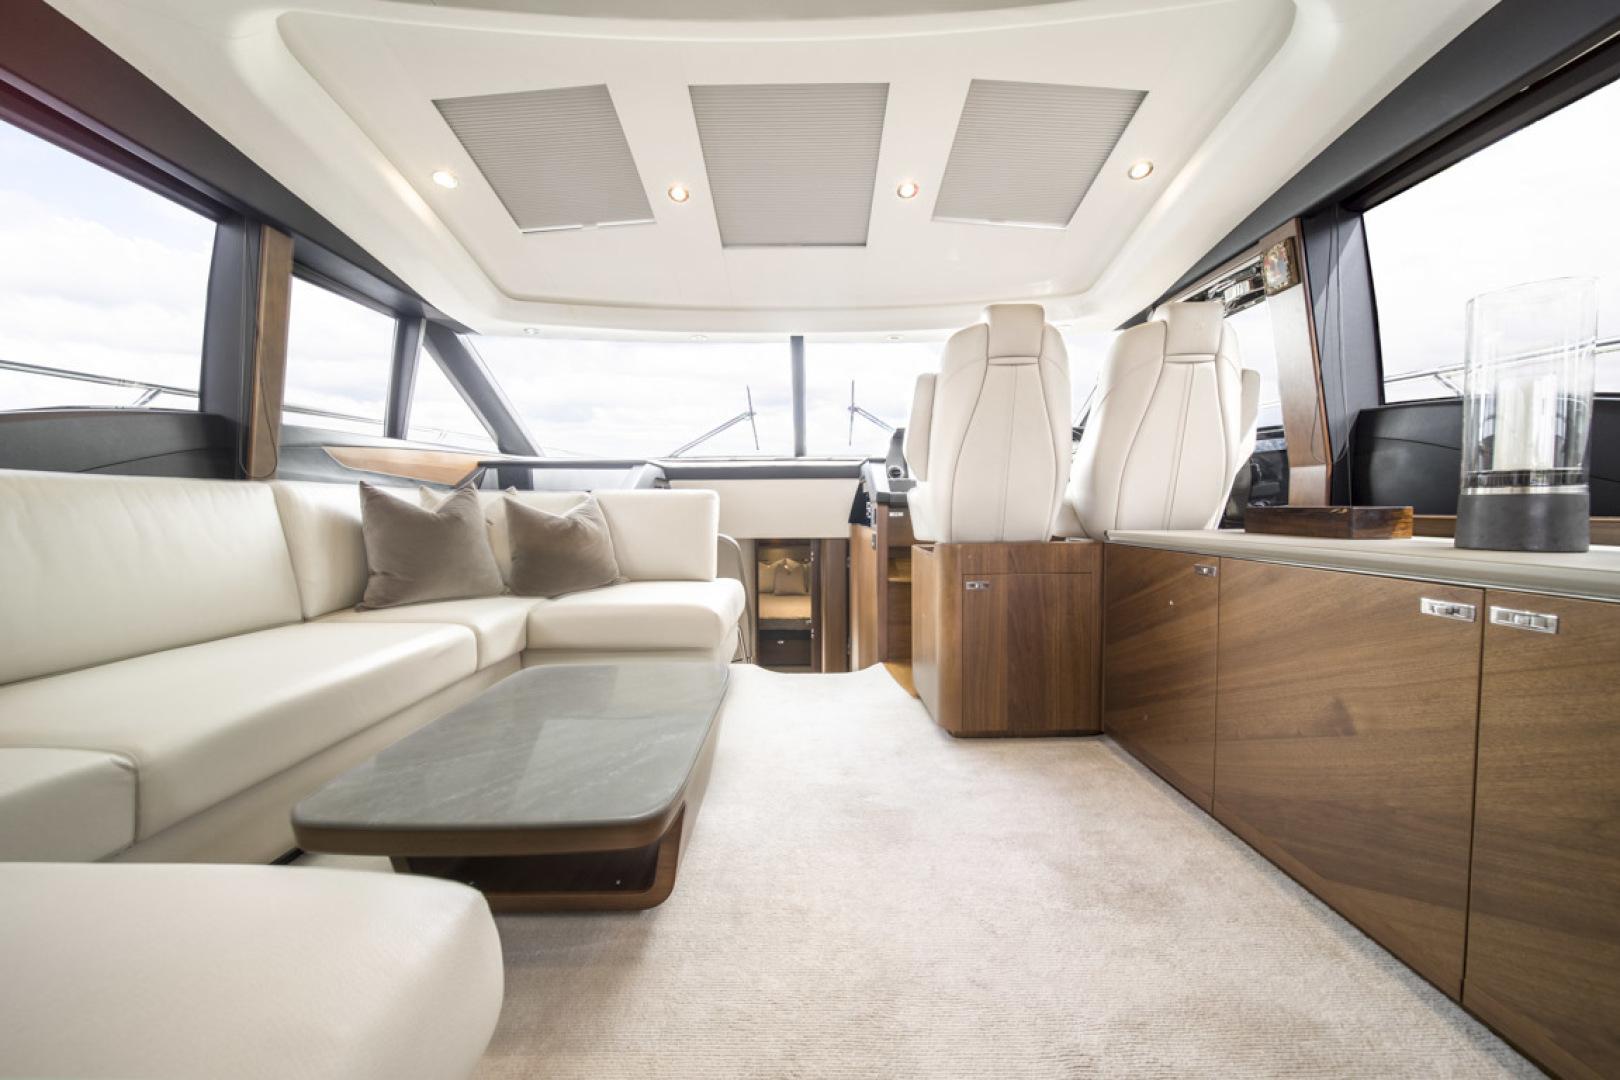 Princess-S65 2019-Paragon Cape Coral-Florida-United States-2019 65 Princess S65-Paragon-Salon-1509913 | Thumbnail